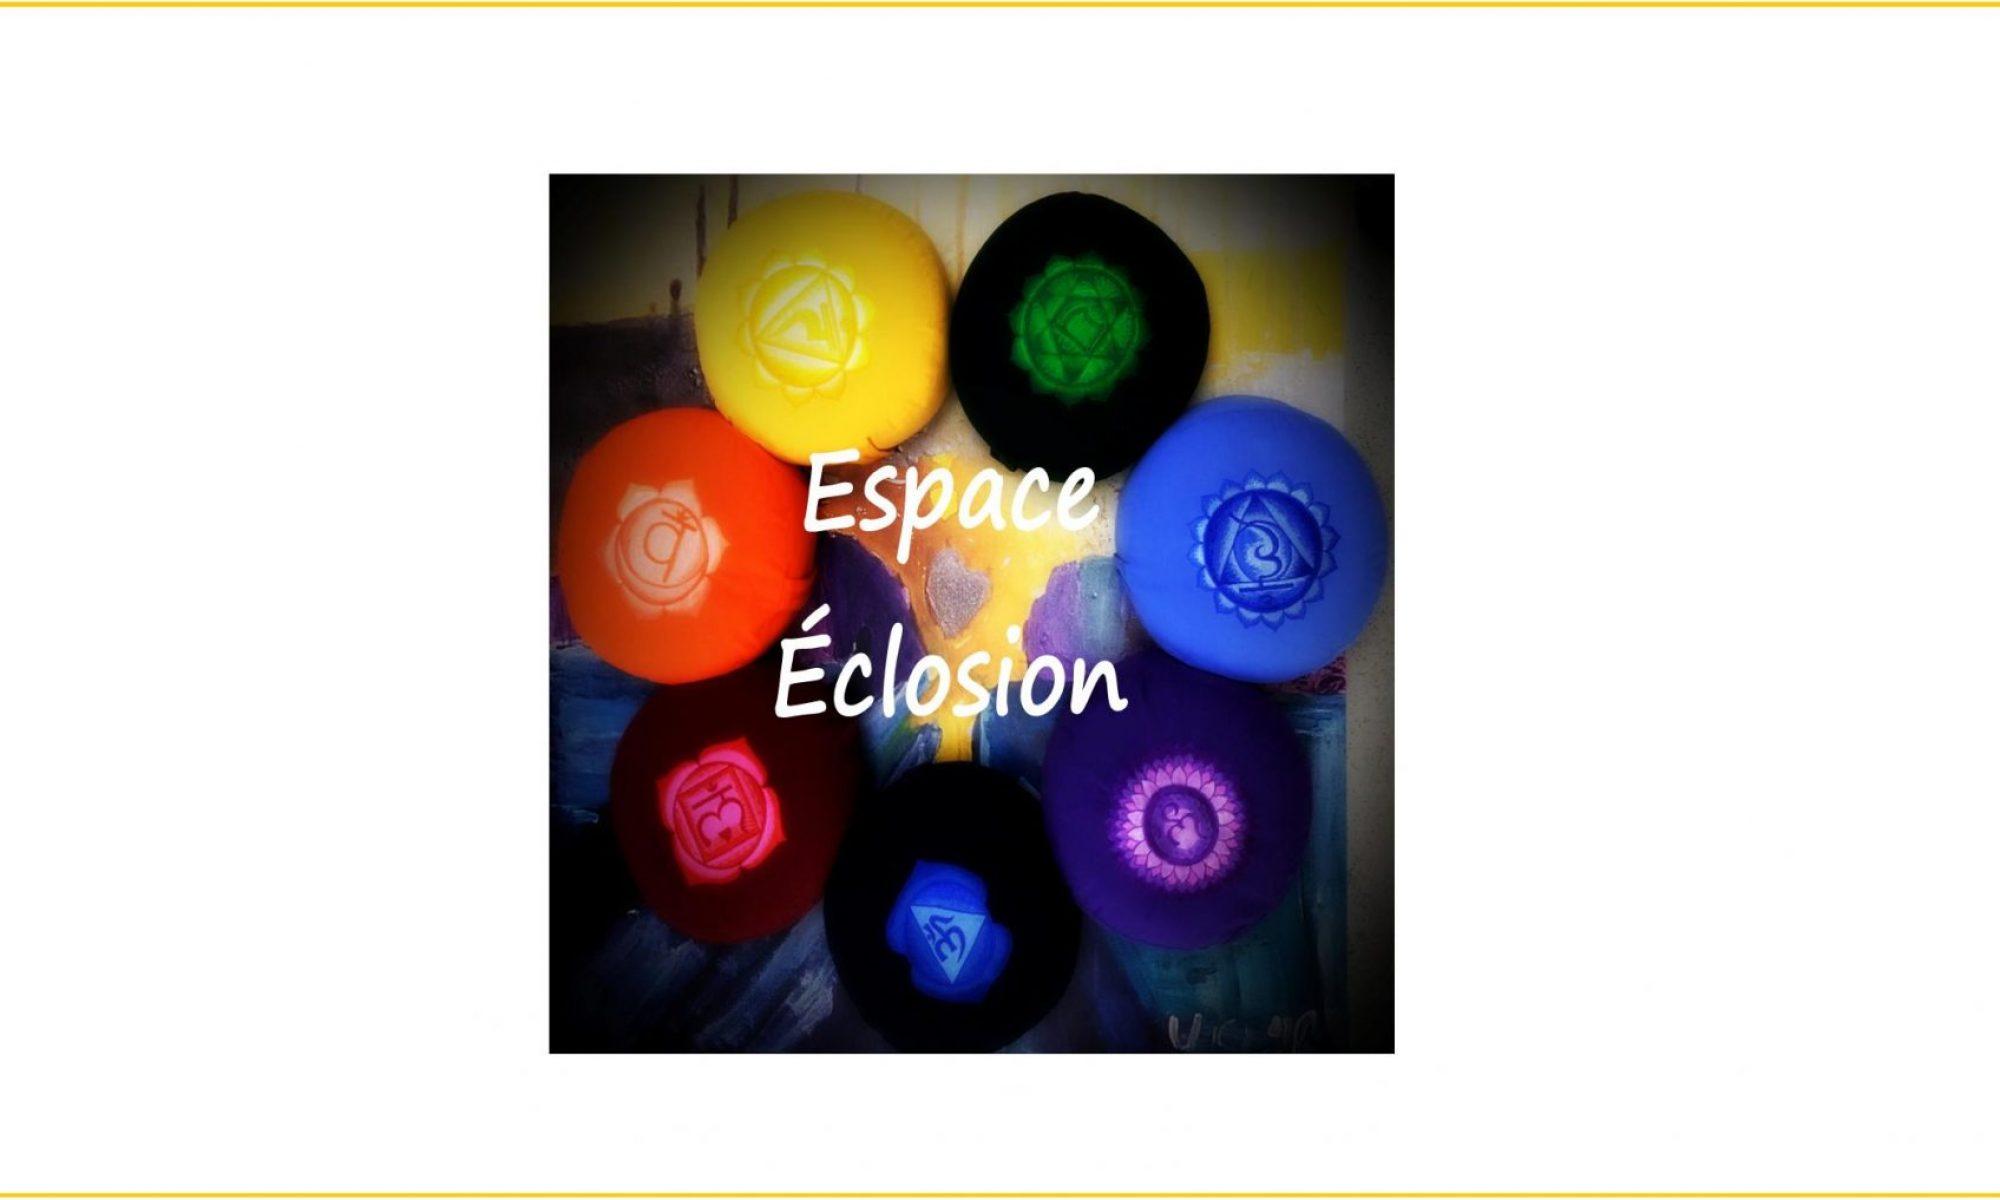 Espace Eclosion